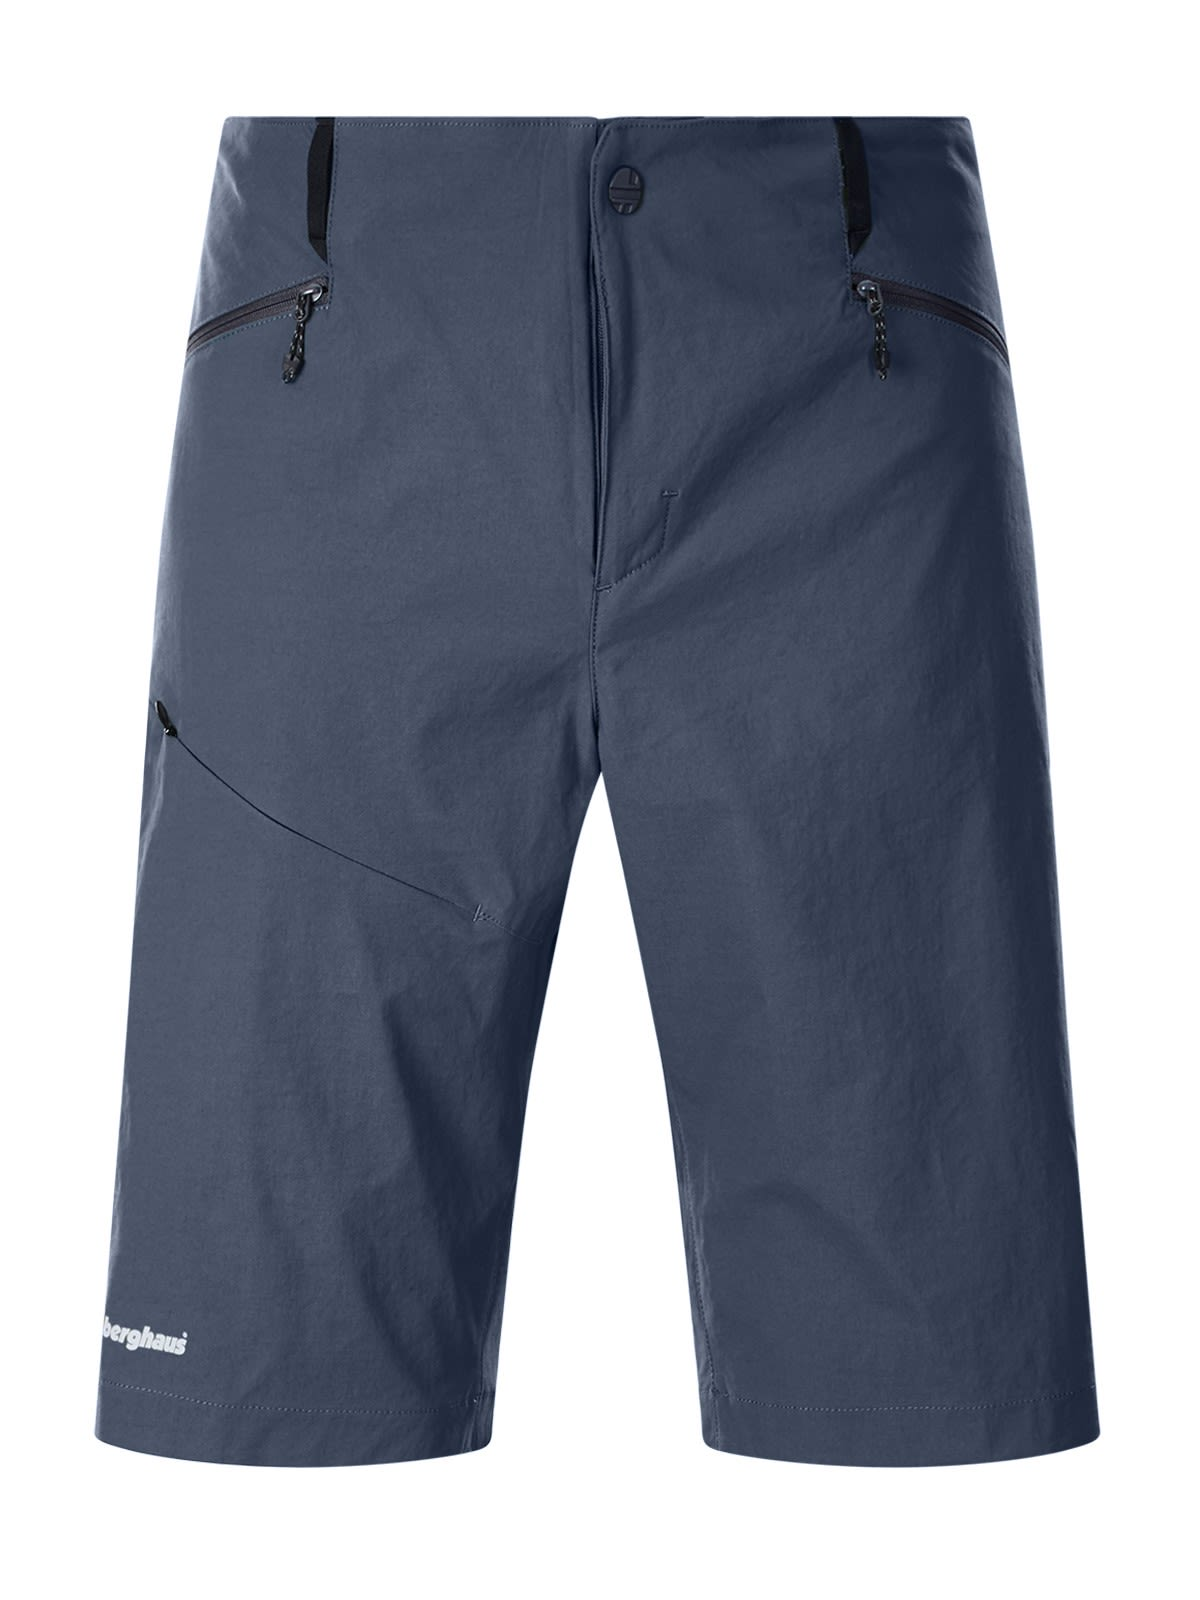 Berghaus Baggy Light Short Blau, Male Shorts, 40